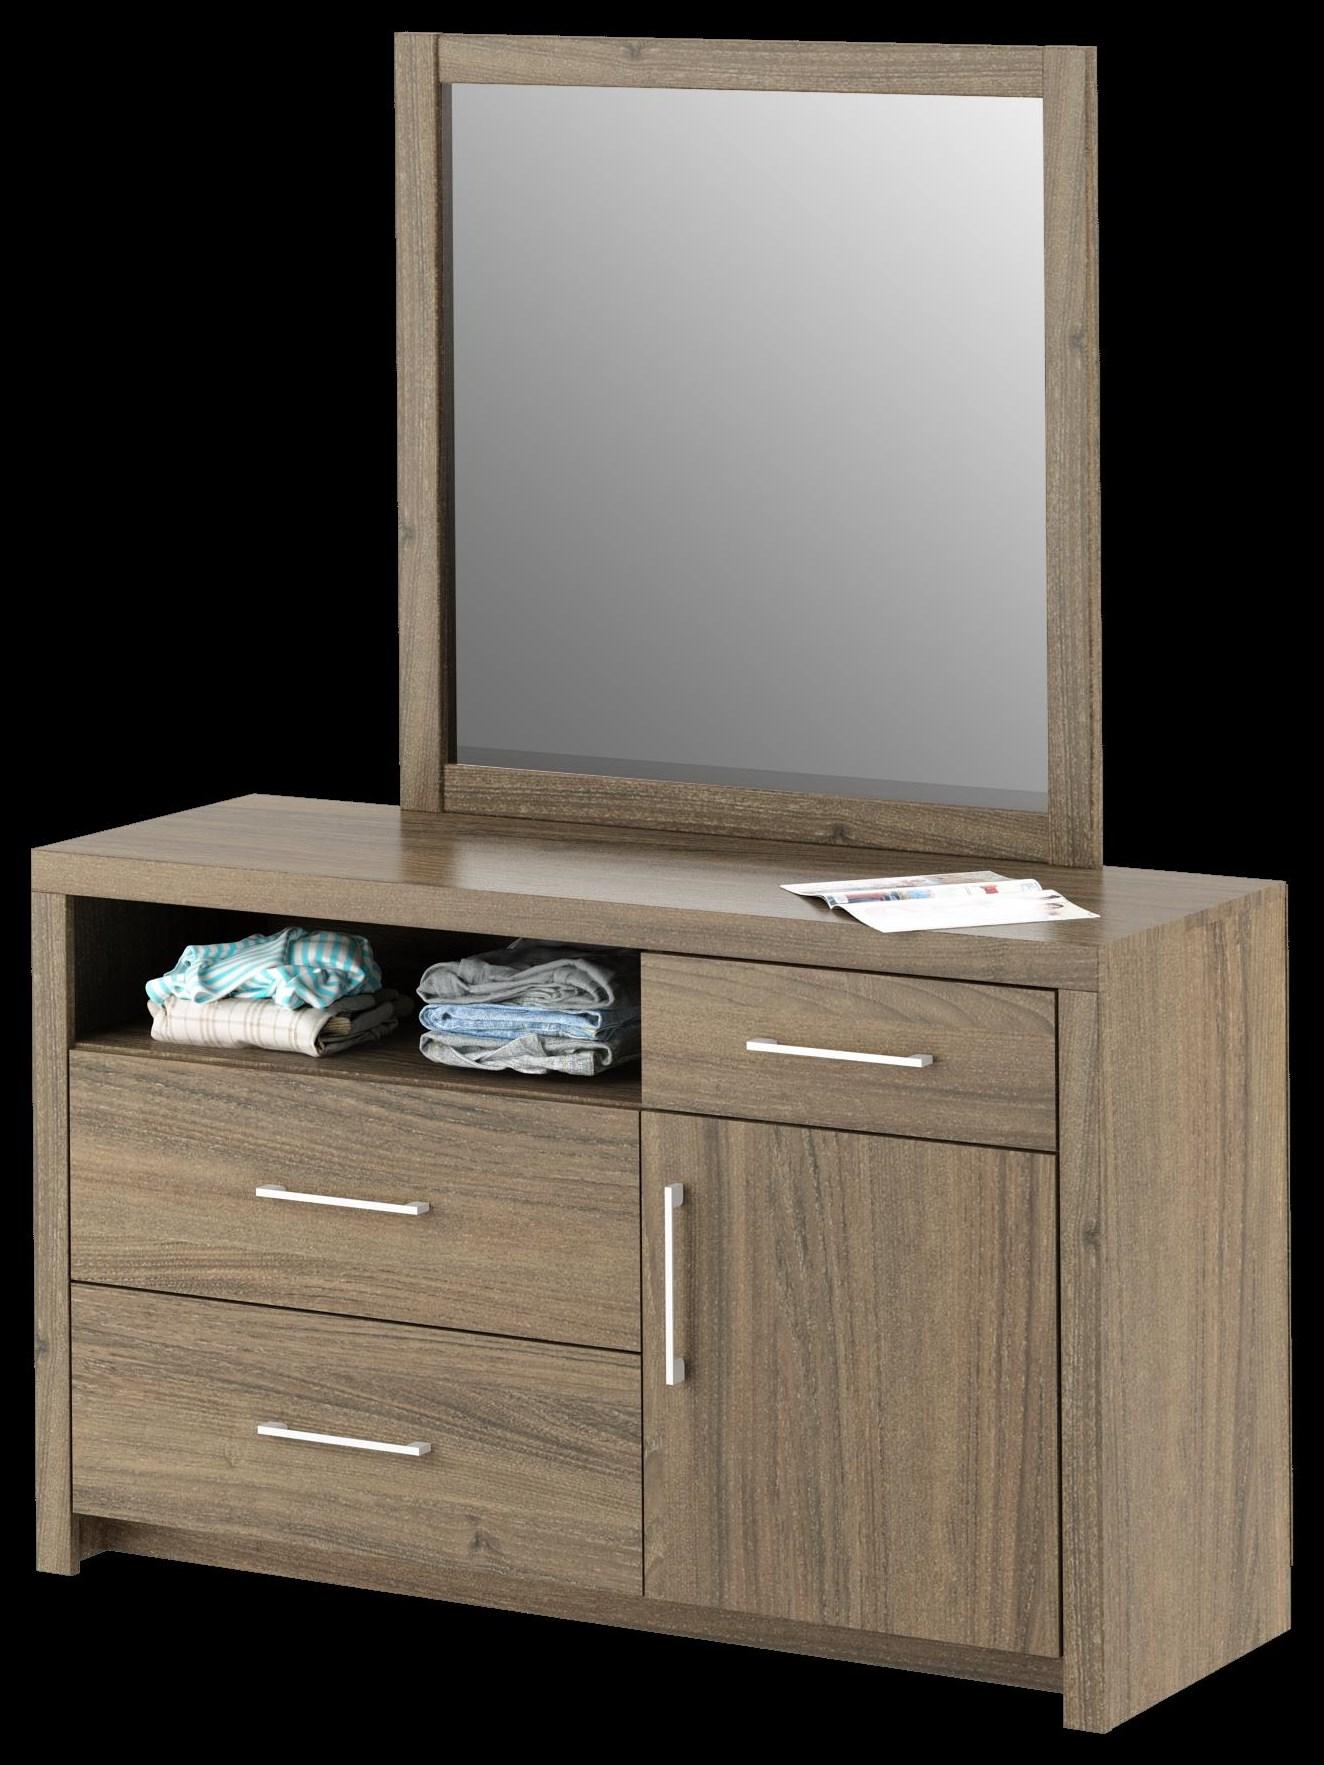 559 Mirror by Defehr at Stoney Creek Furniture